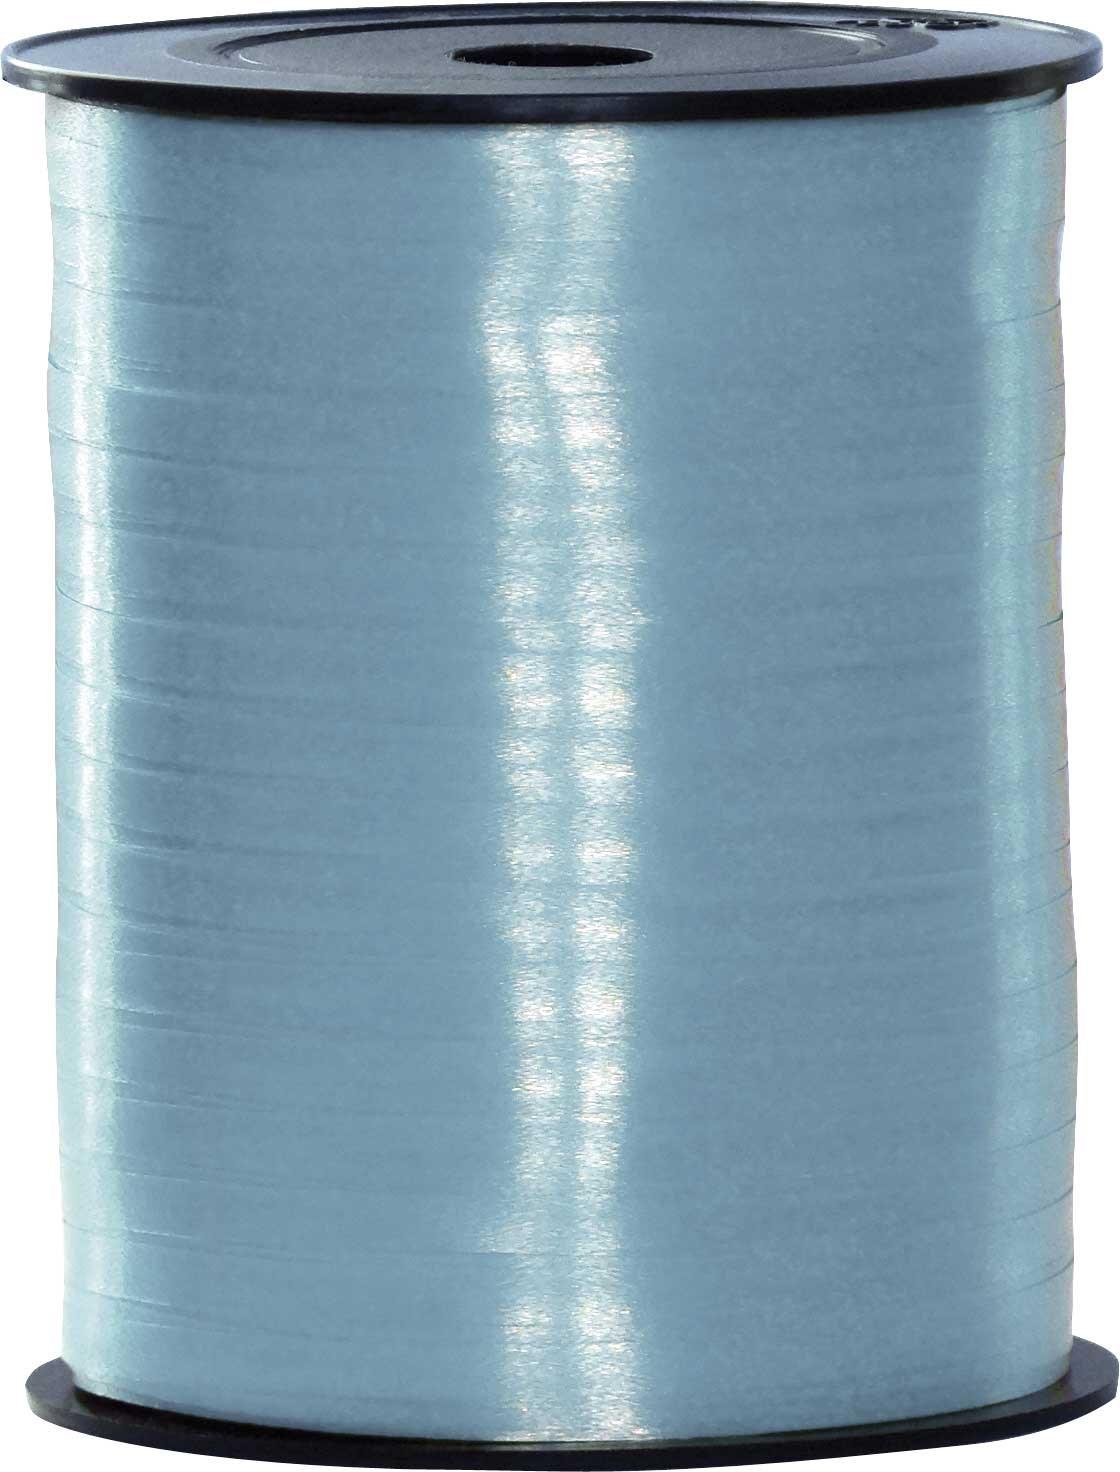 Polyband baby blauw 500mx5mm